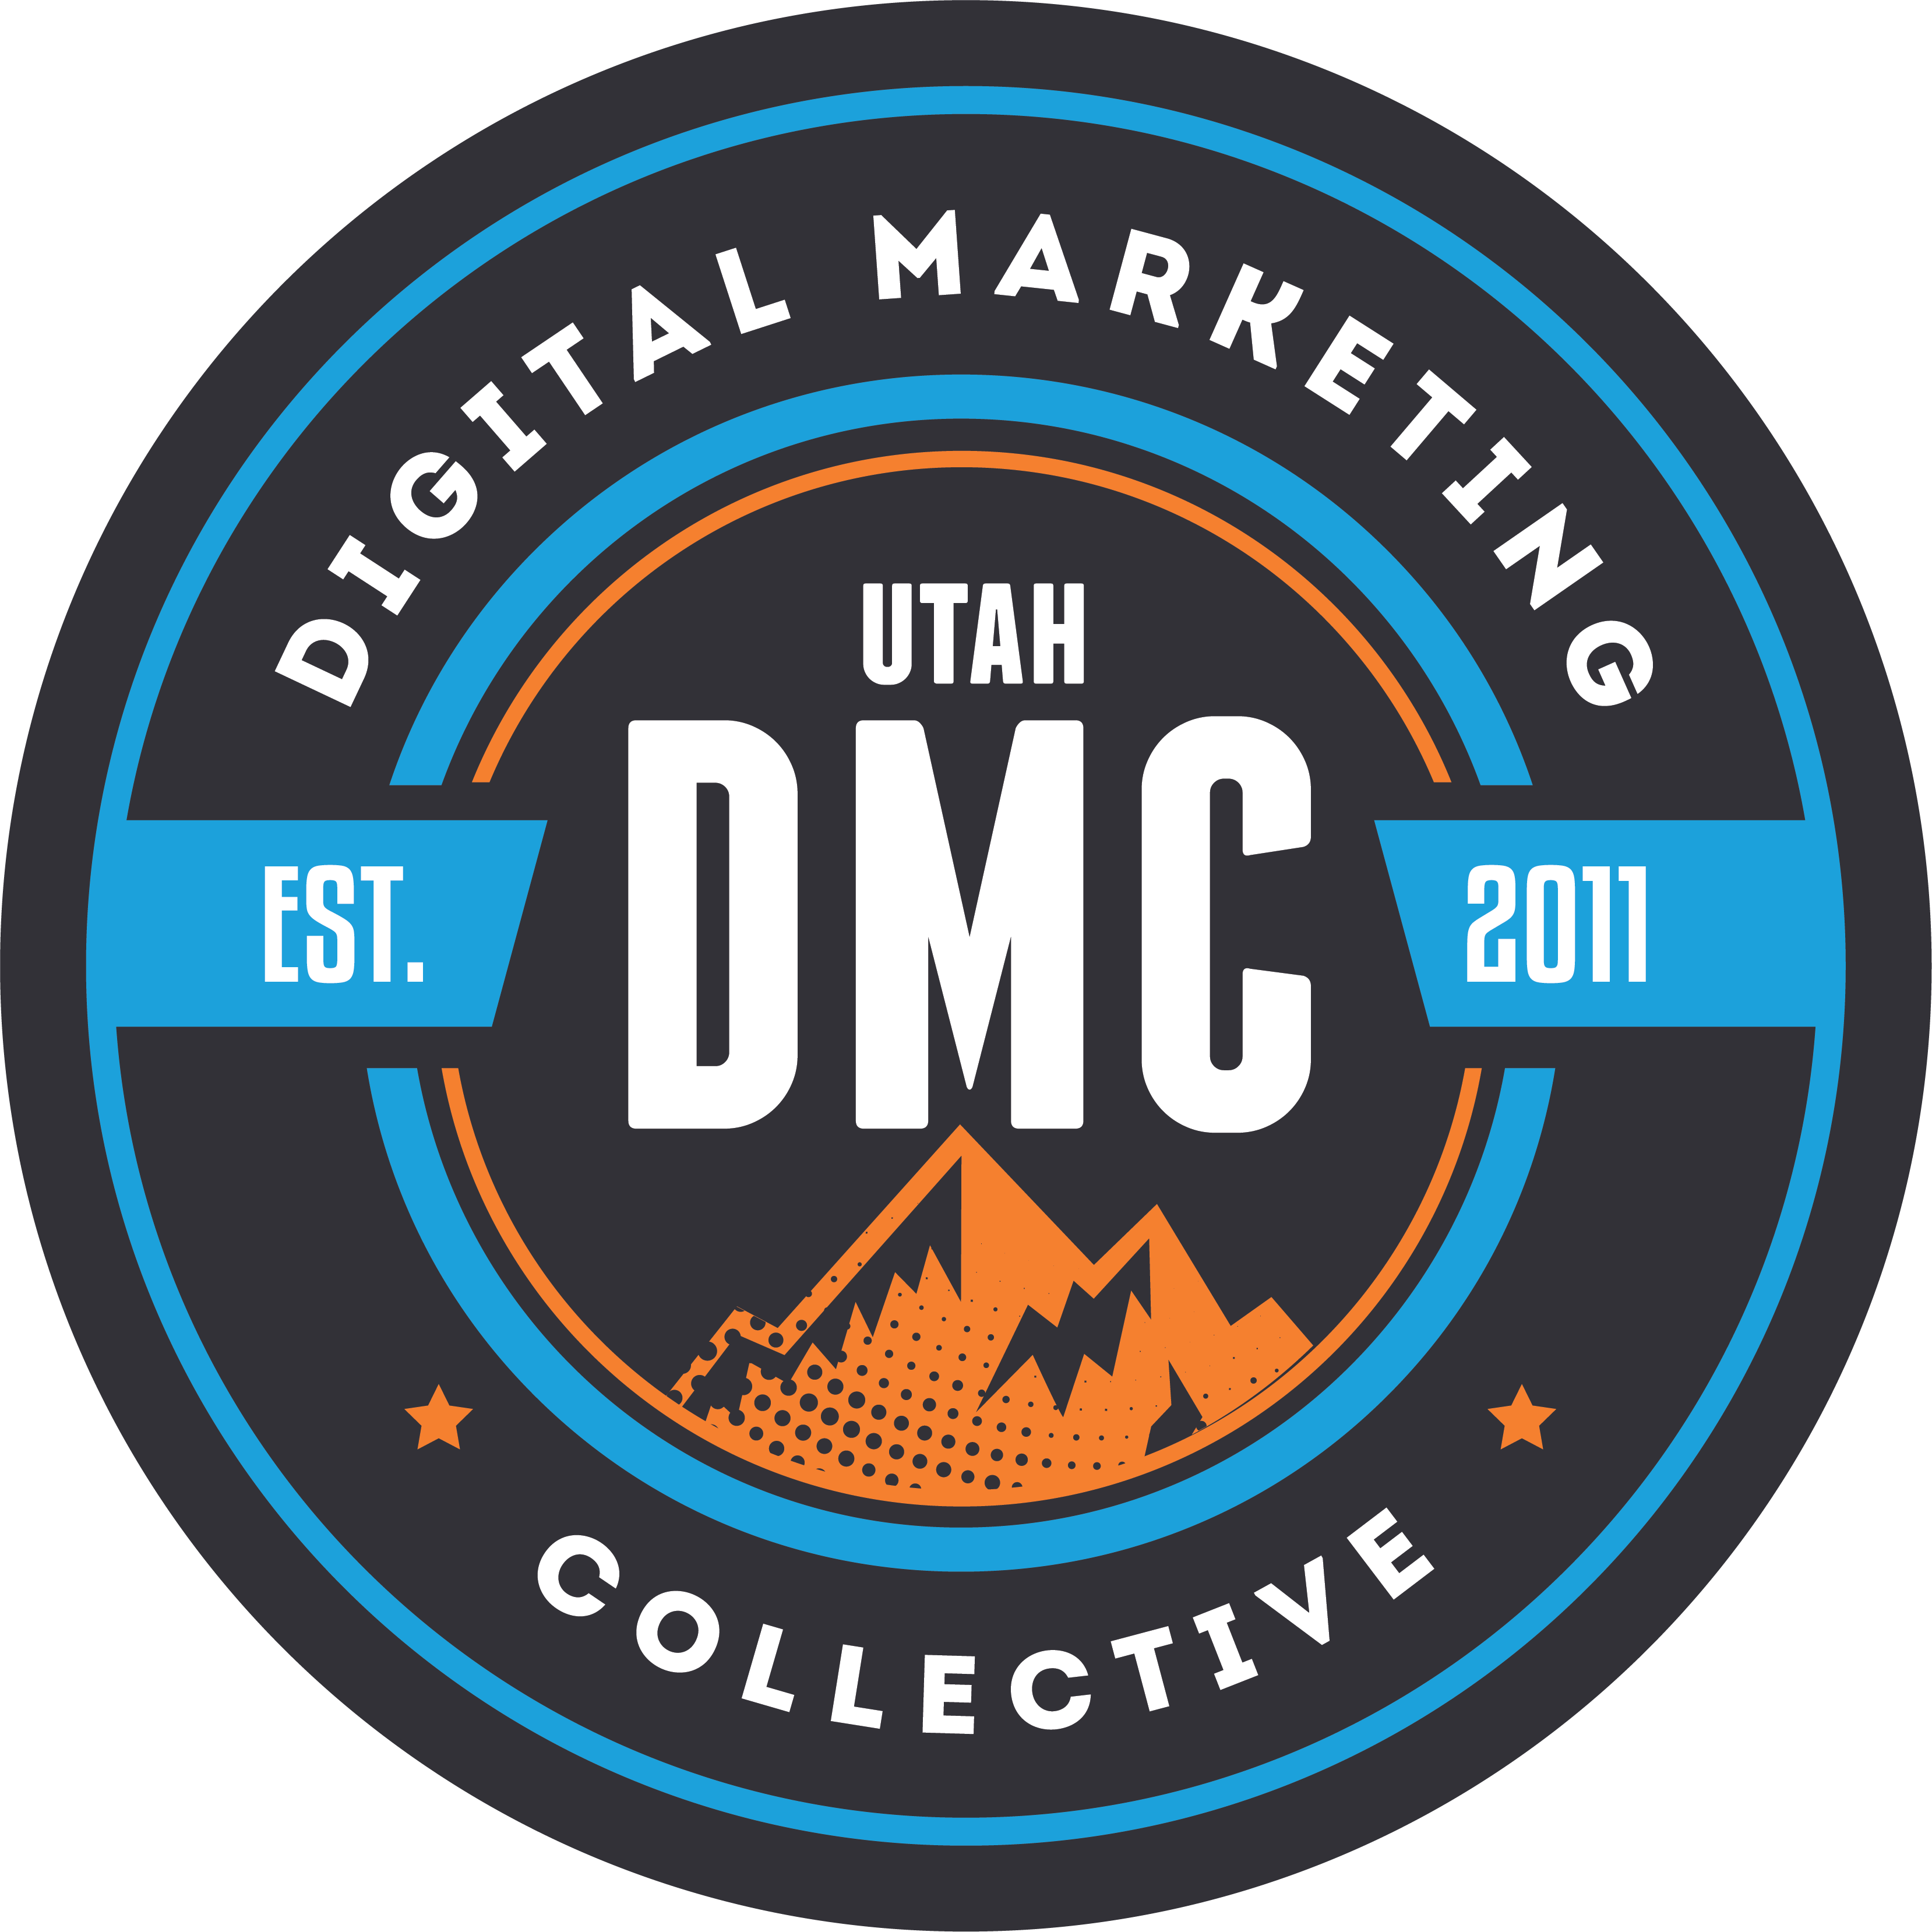 Utah DMC - Digital Marketing Collective